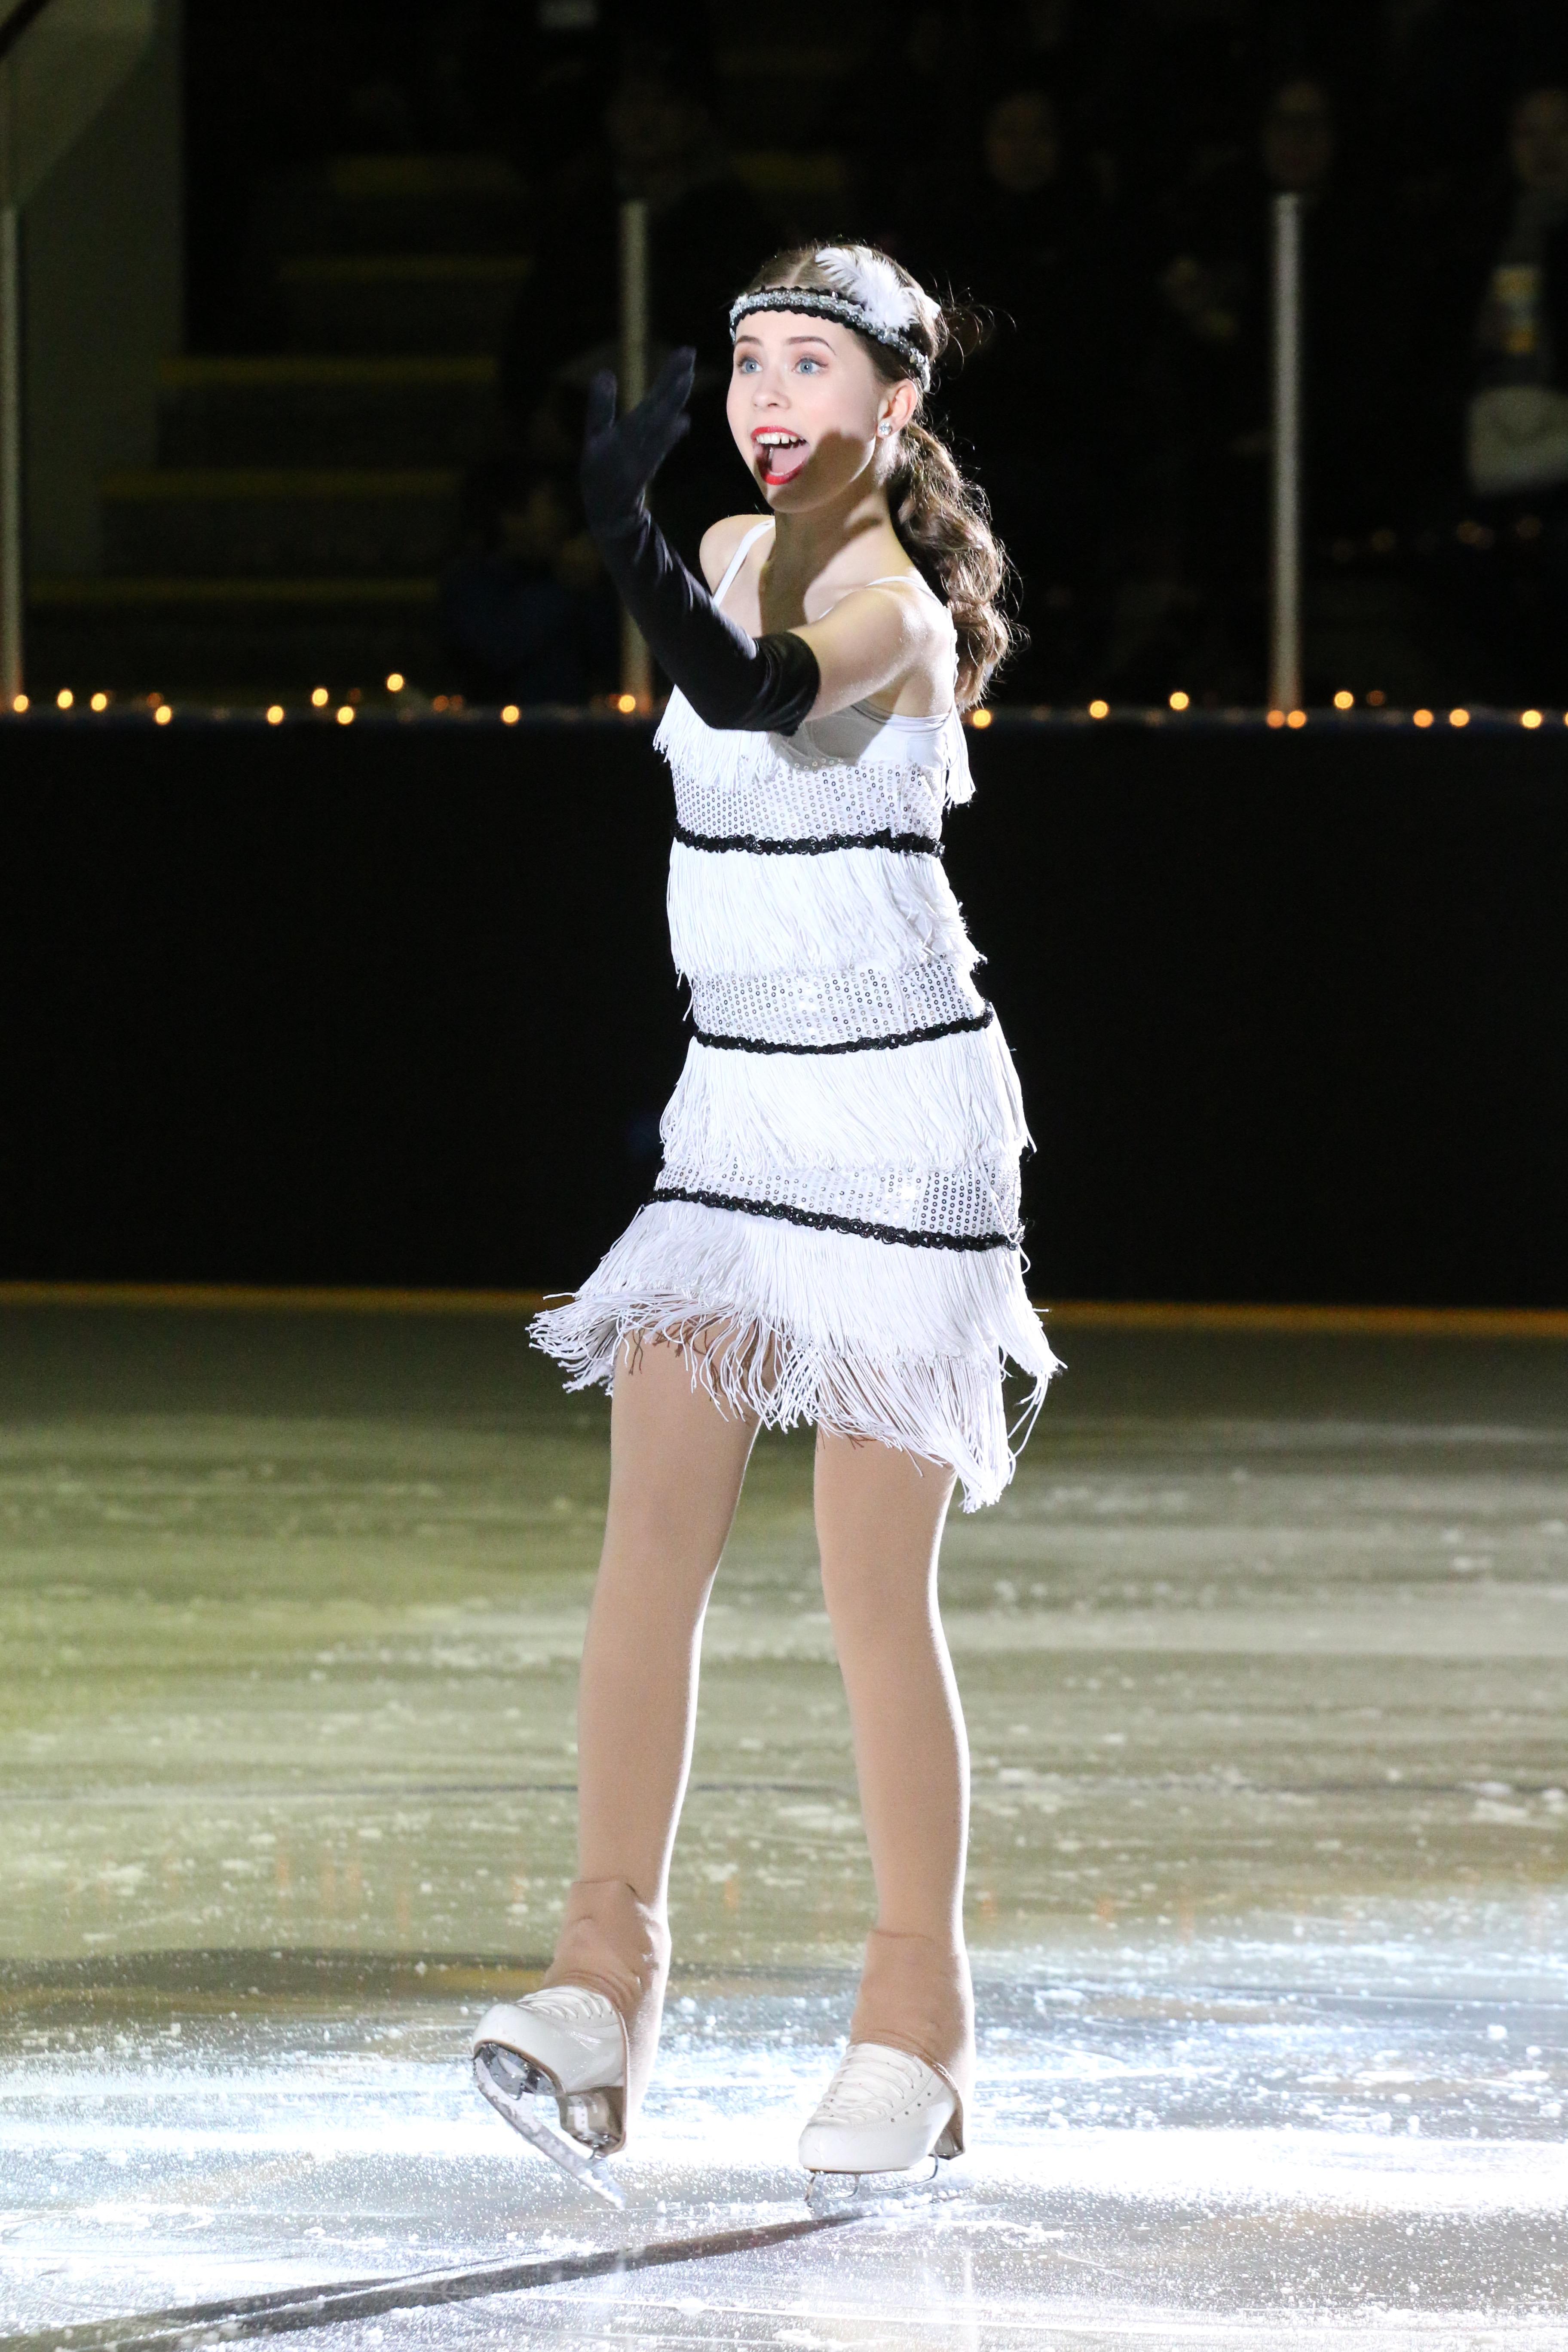 Sara Morrow Ice Show 2018